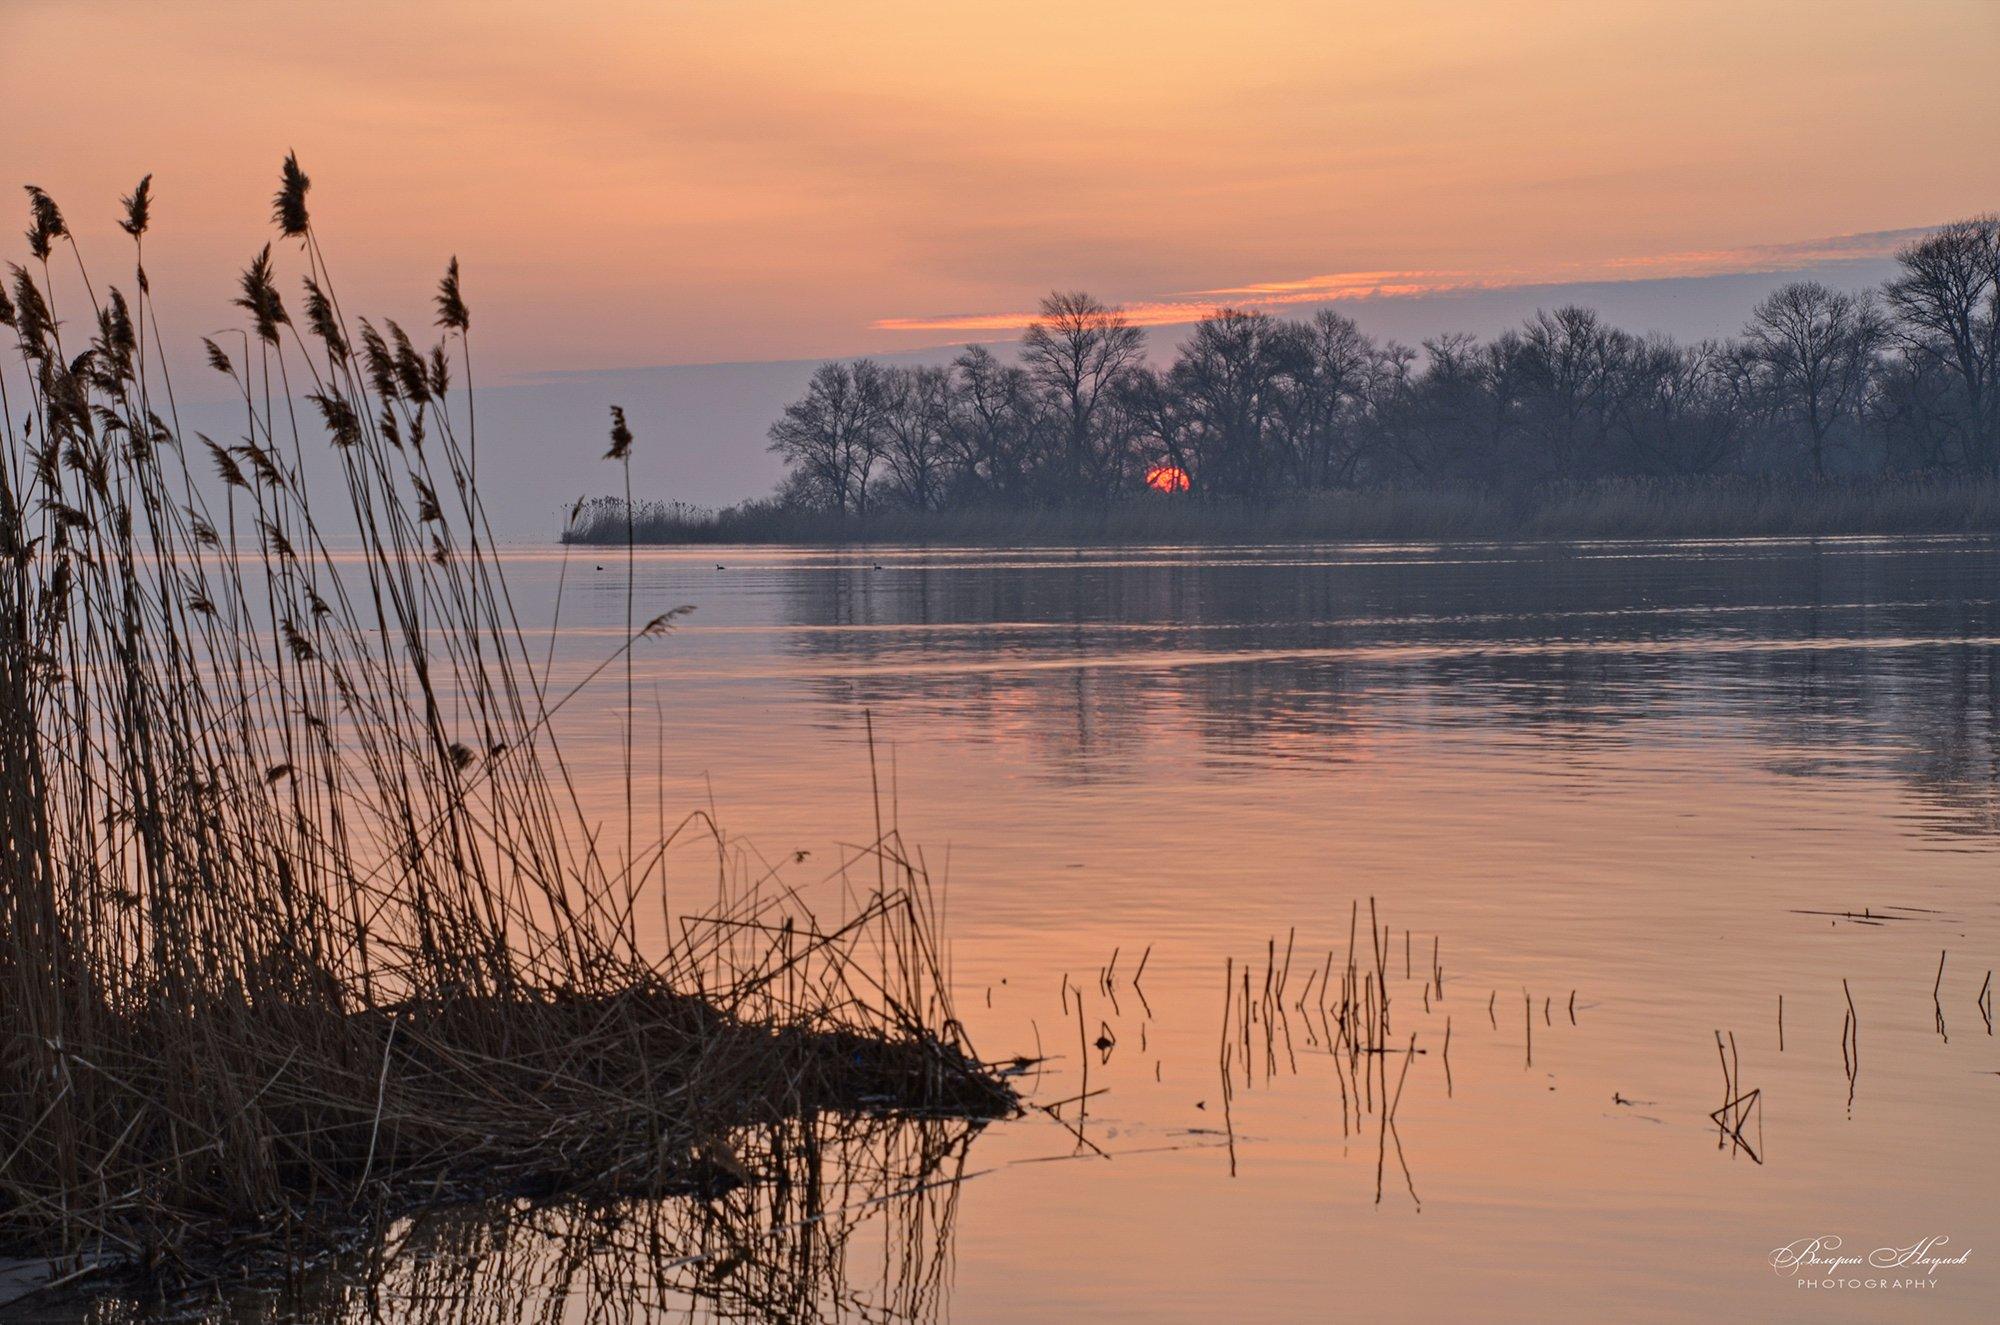 утро, восход, солнце, рассвет, апрель, туман, Валерий Наумов